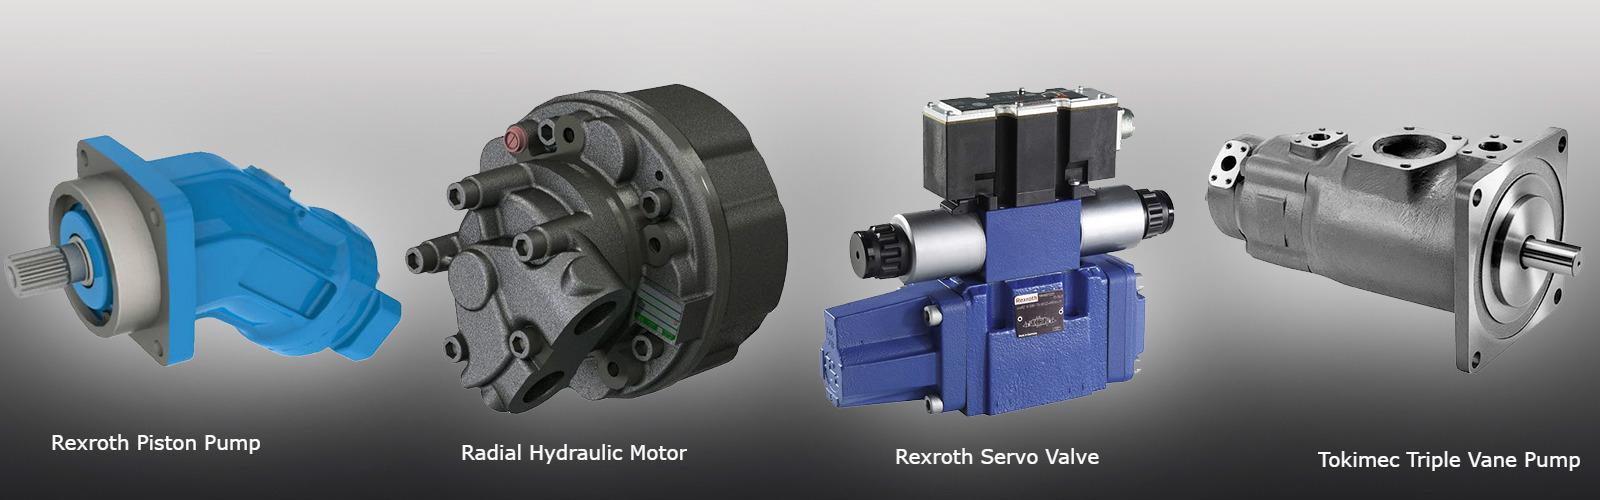 Hydraulic Motor, Pump and Valve